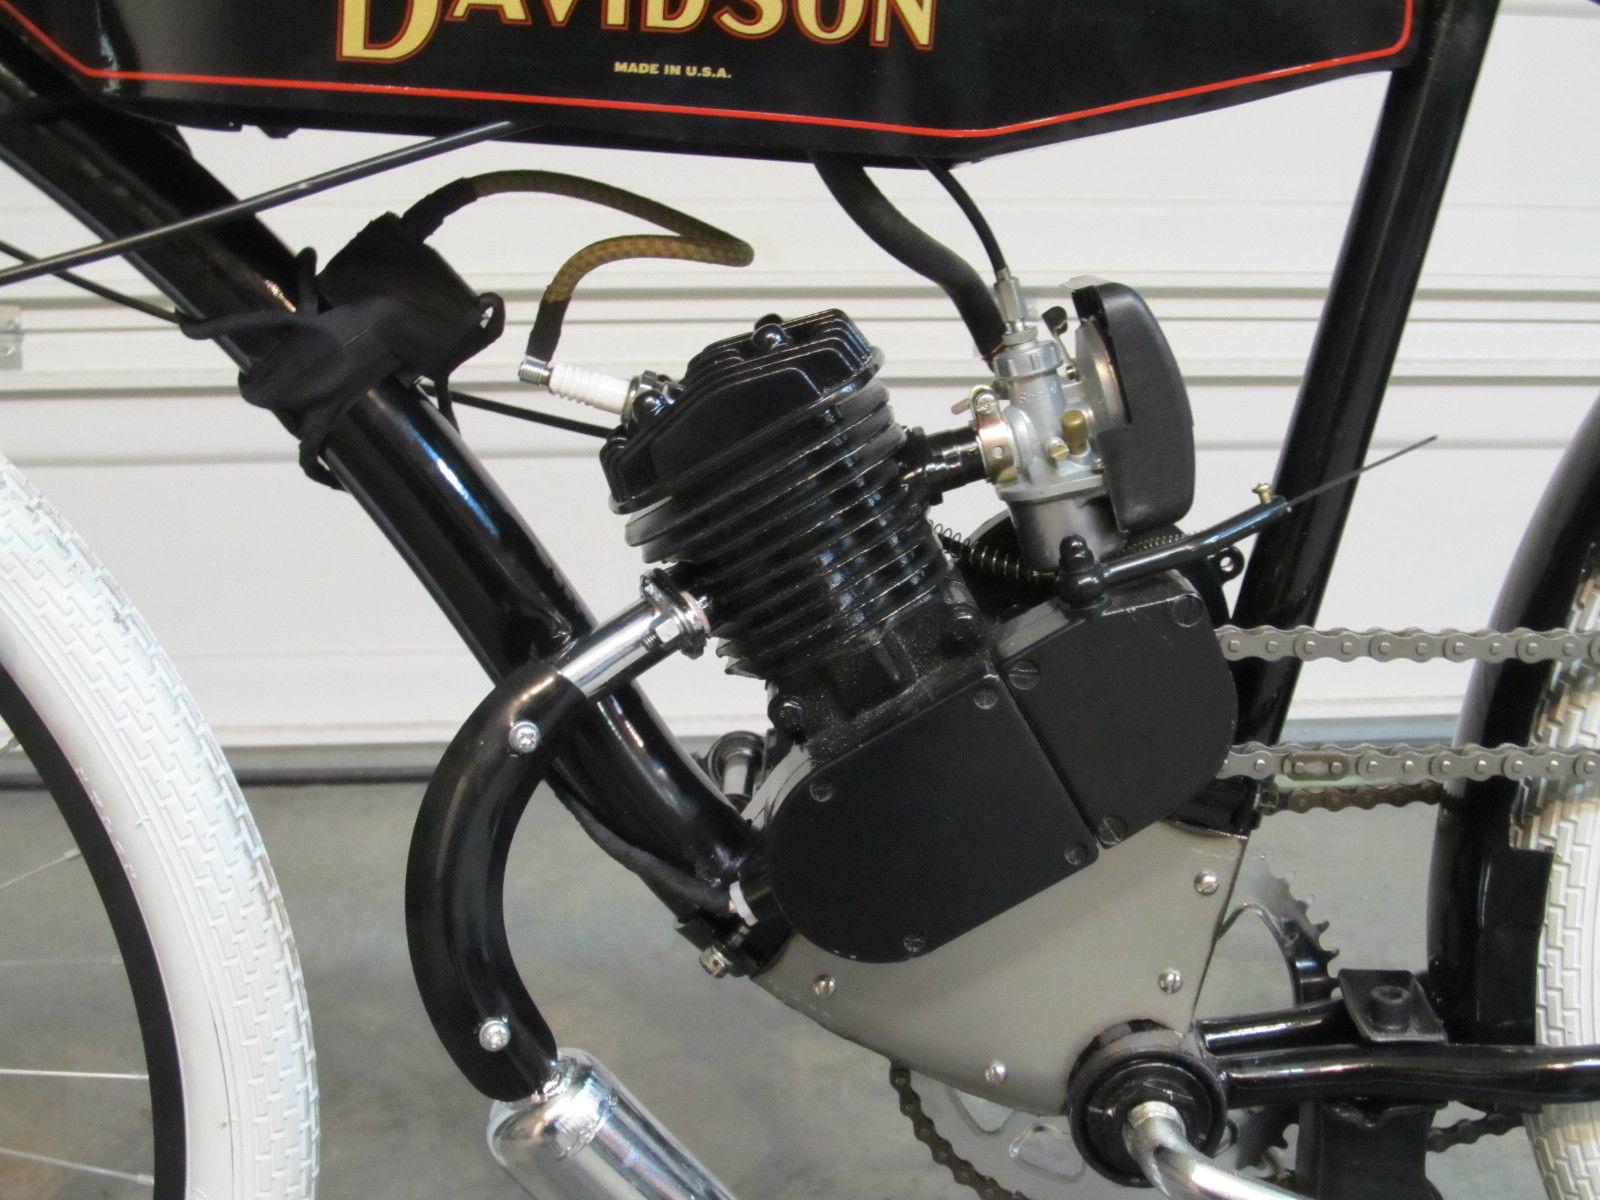 Vintage harley davidson flat track racing motorcycle